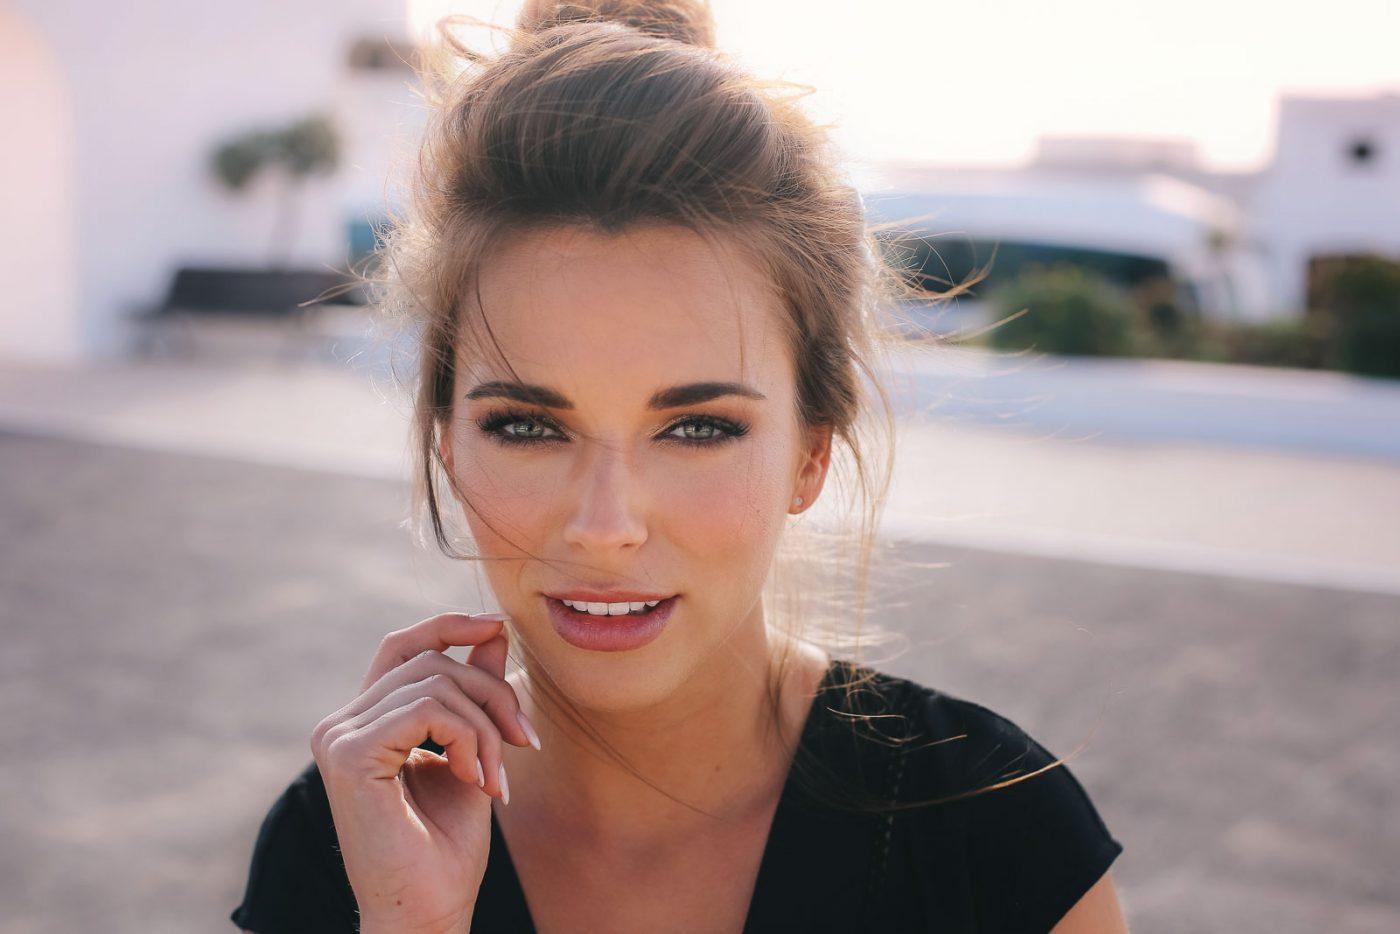 Femme Portrait Visage Brune Soleil Maquillage Ange